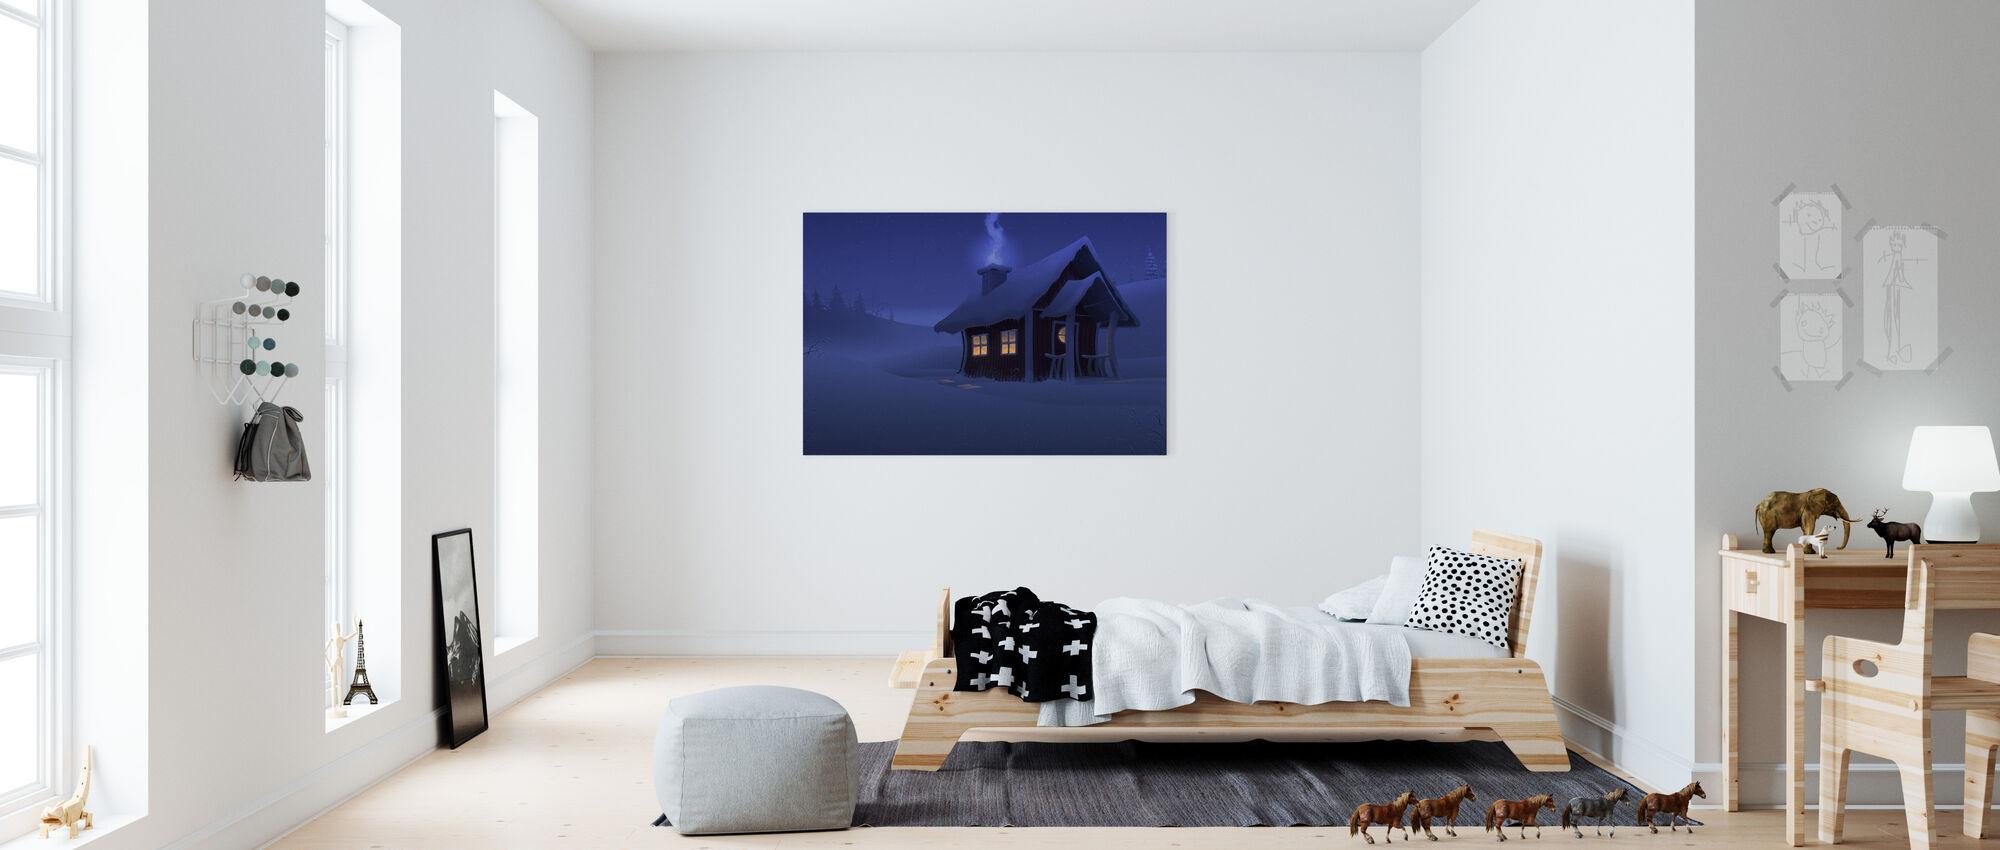 Xmas House - Canvas print - Kids Room